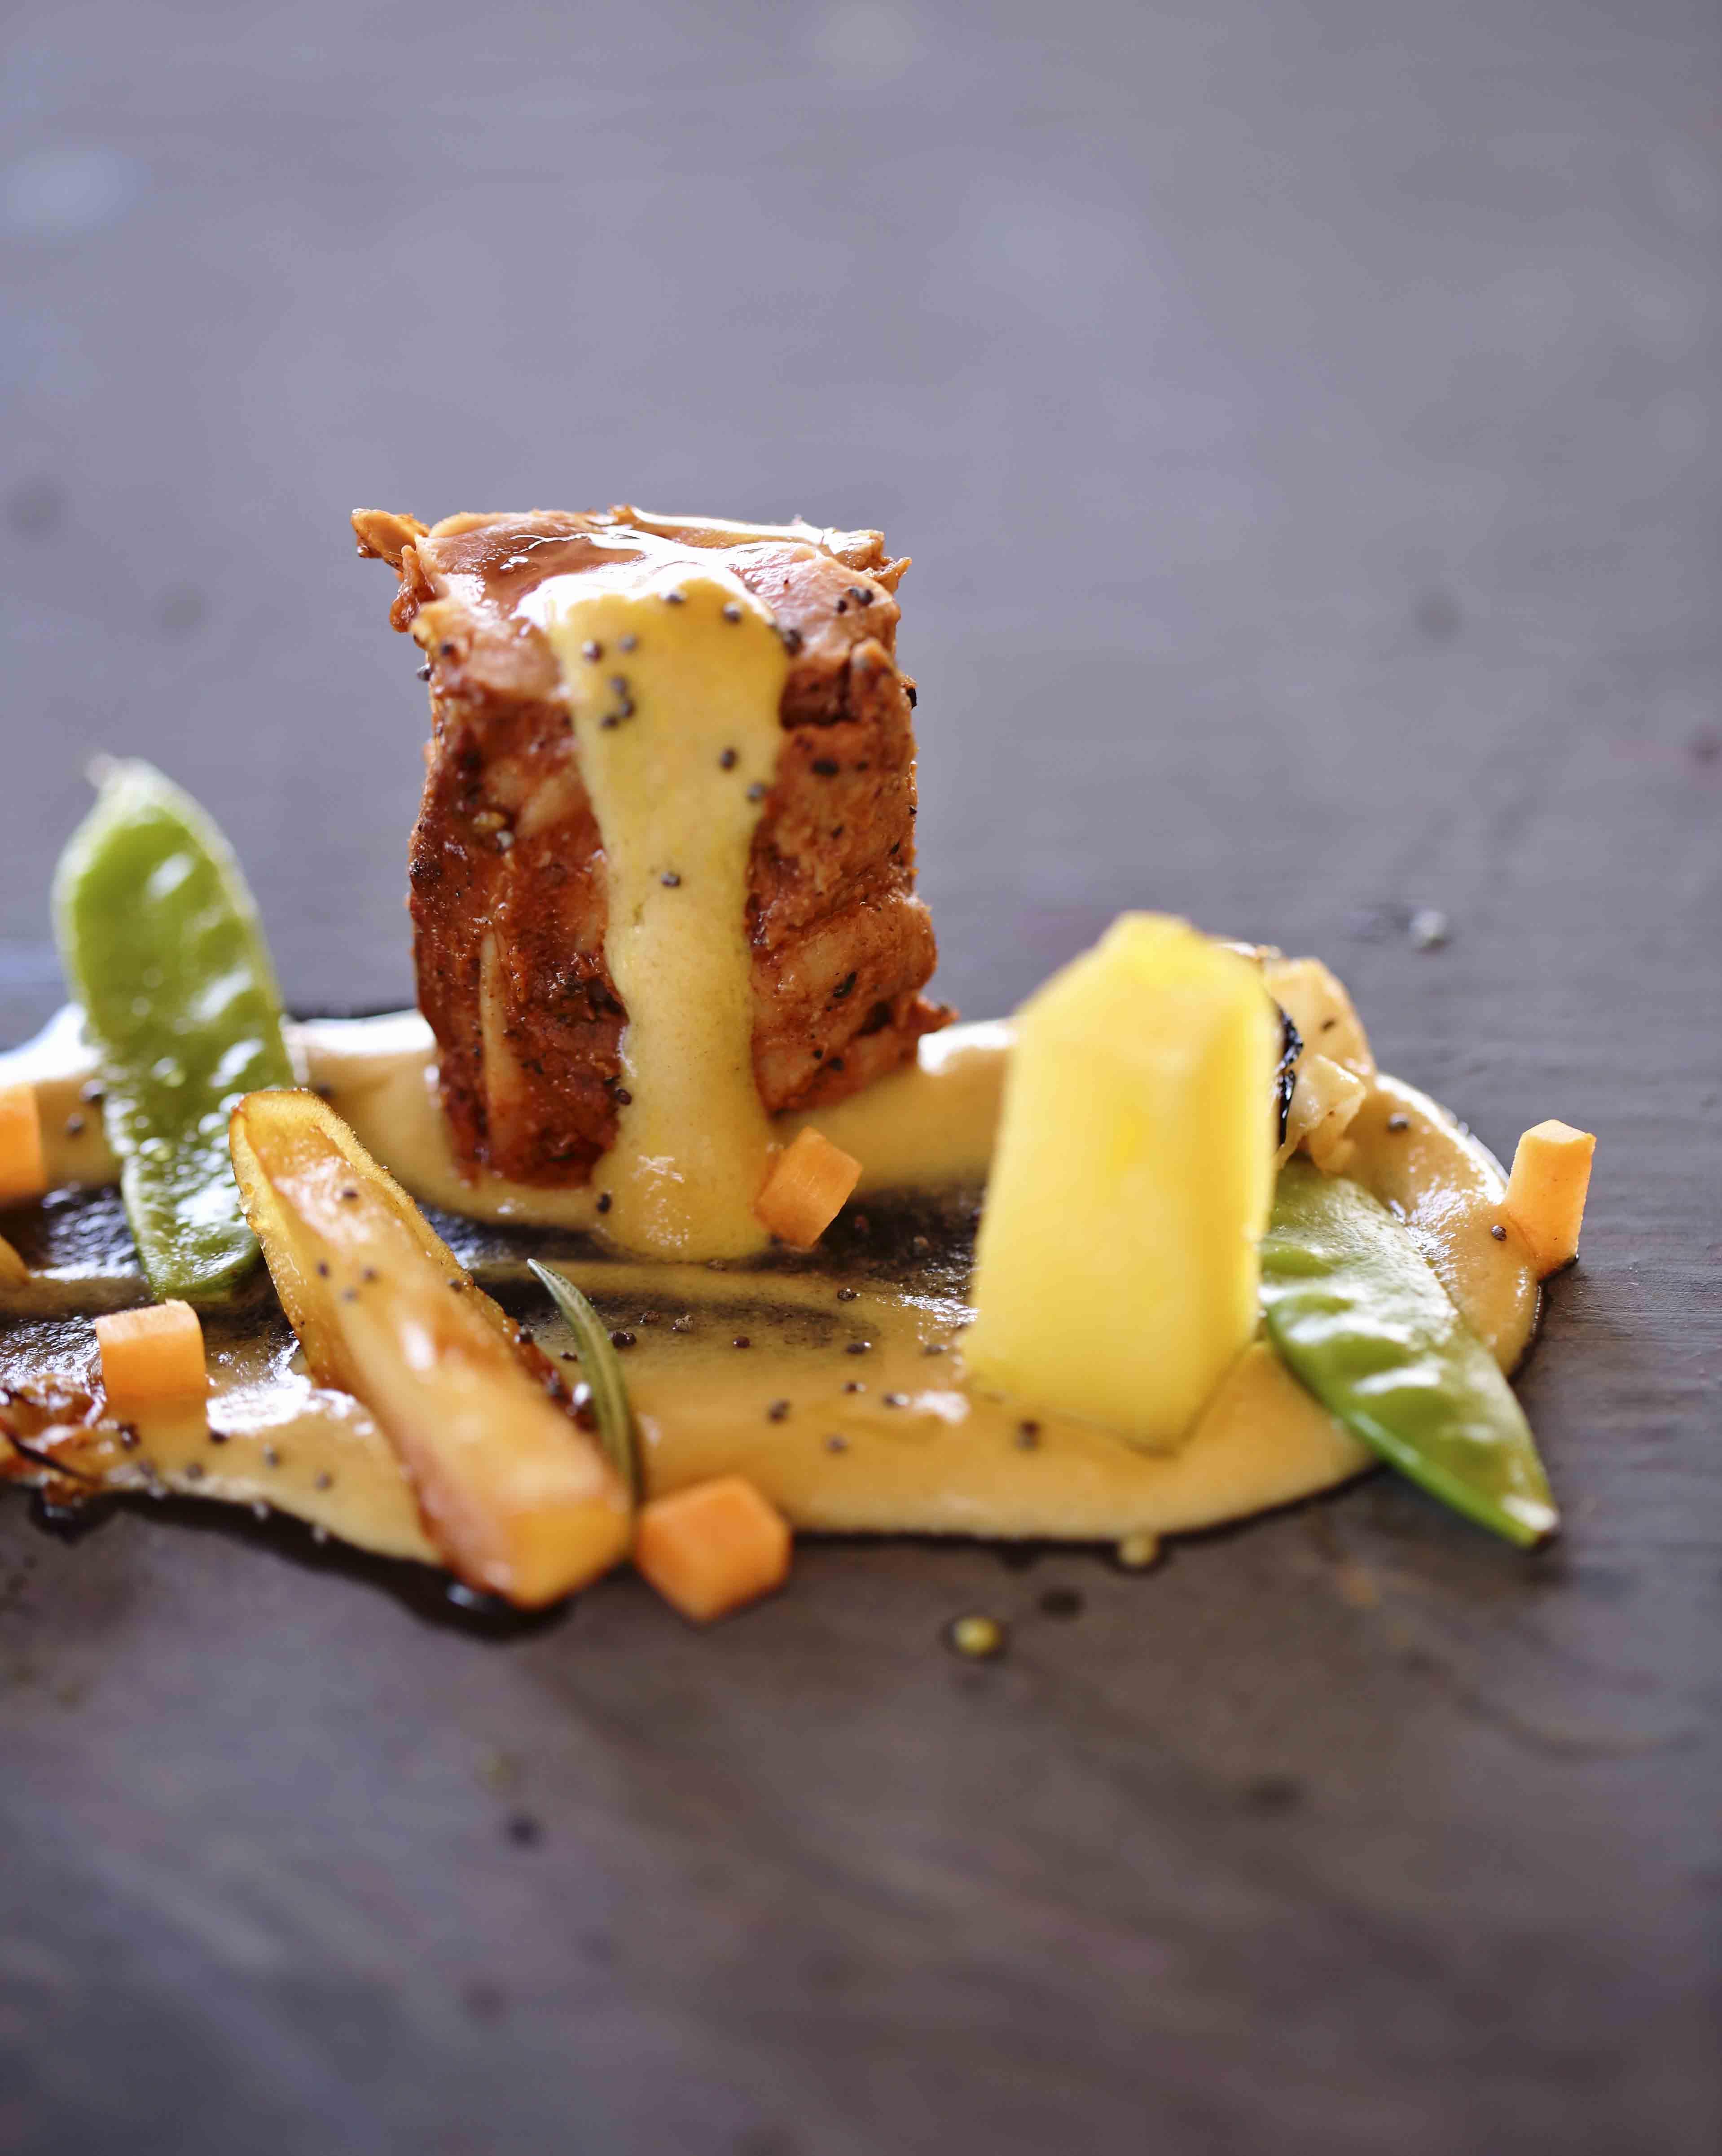 Pork loin with homemade honey mustard mayo potatoes confit pumpkin cubes and green 2